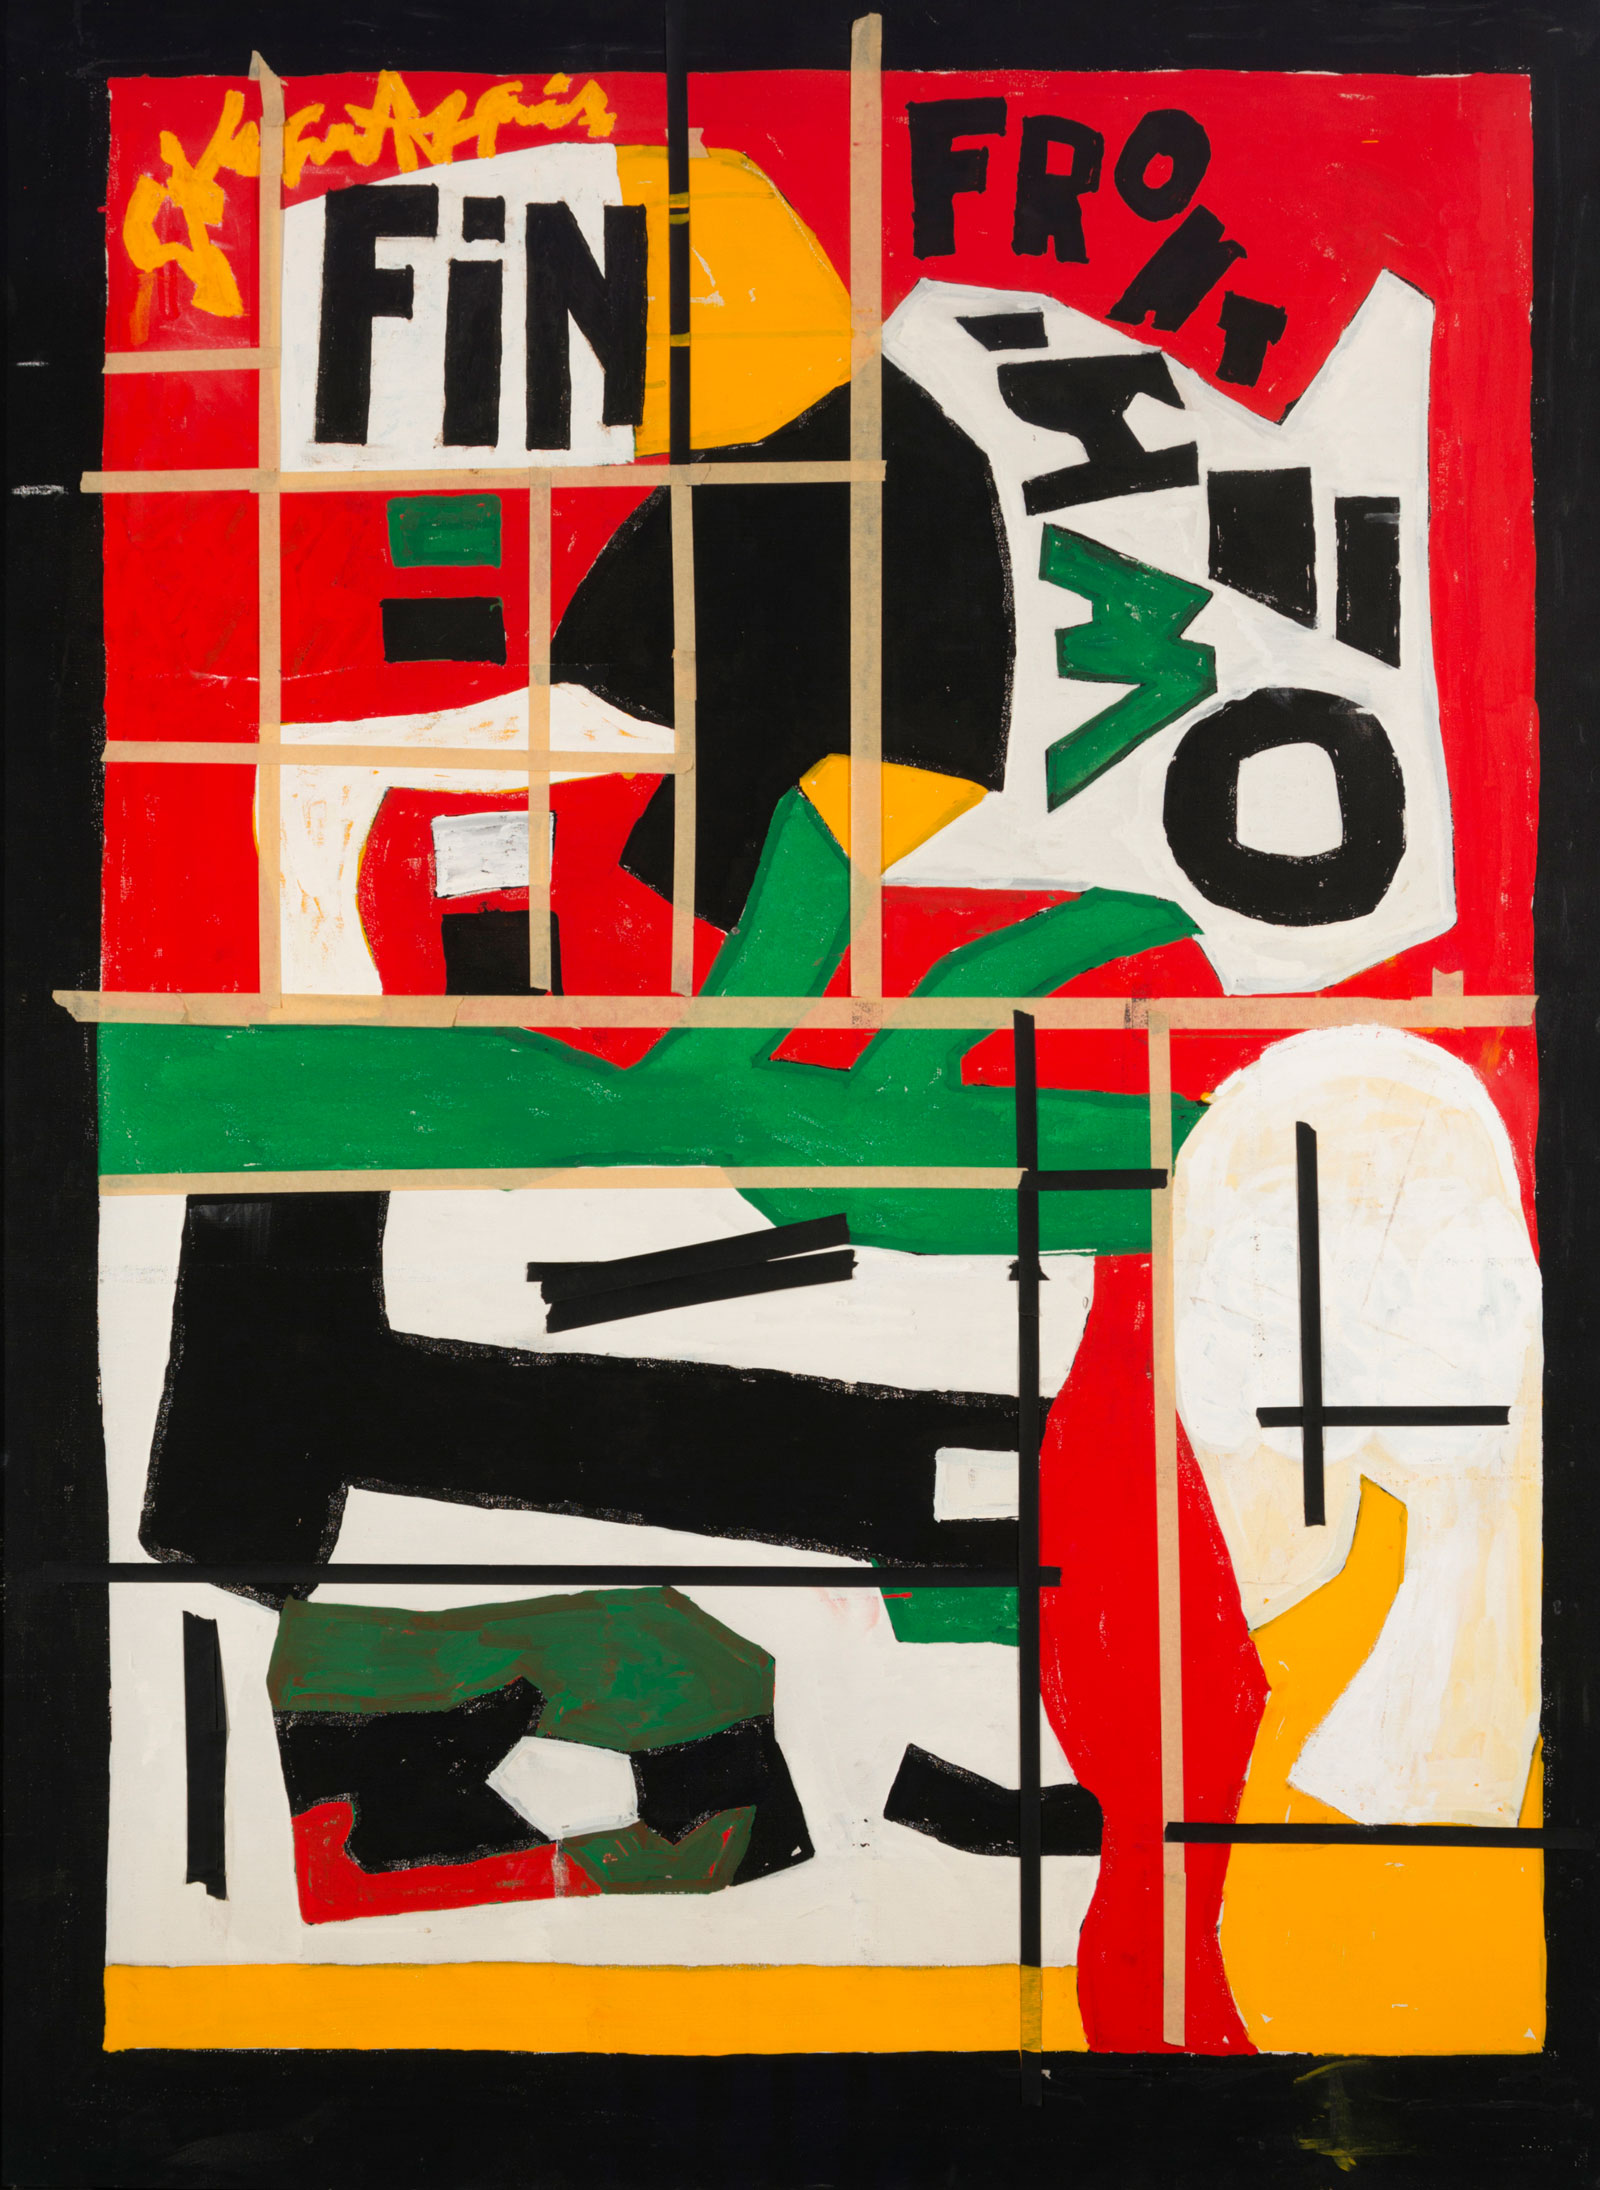 Stuart Davis: Fin, 1962–1964